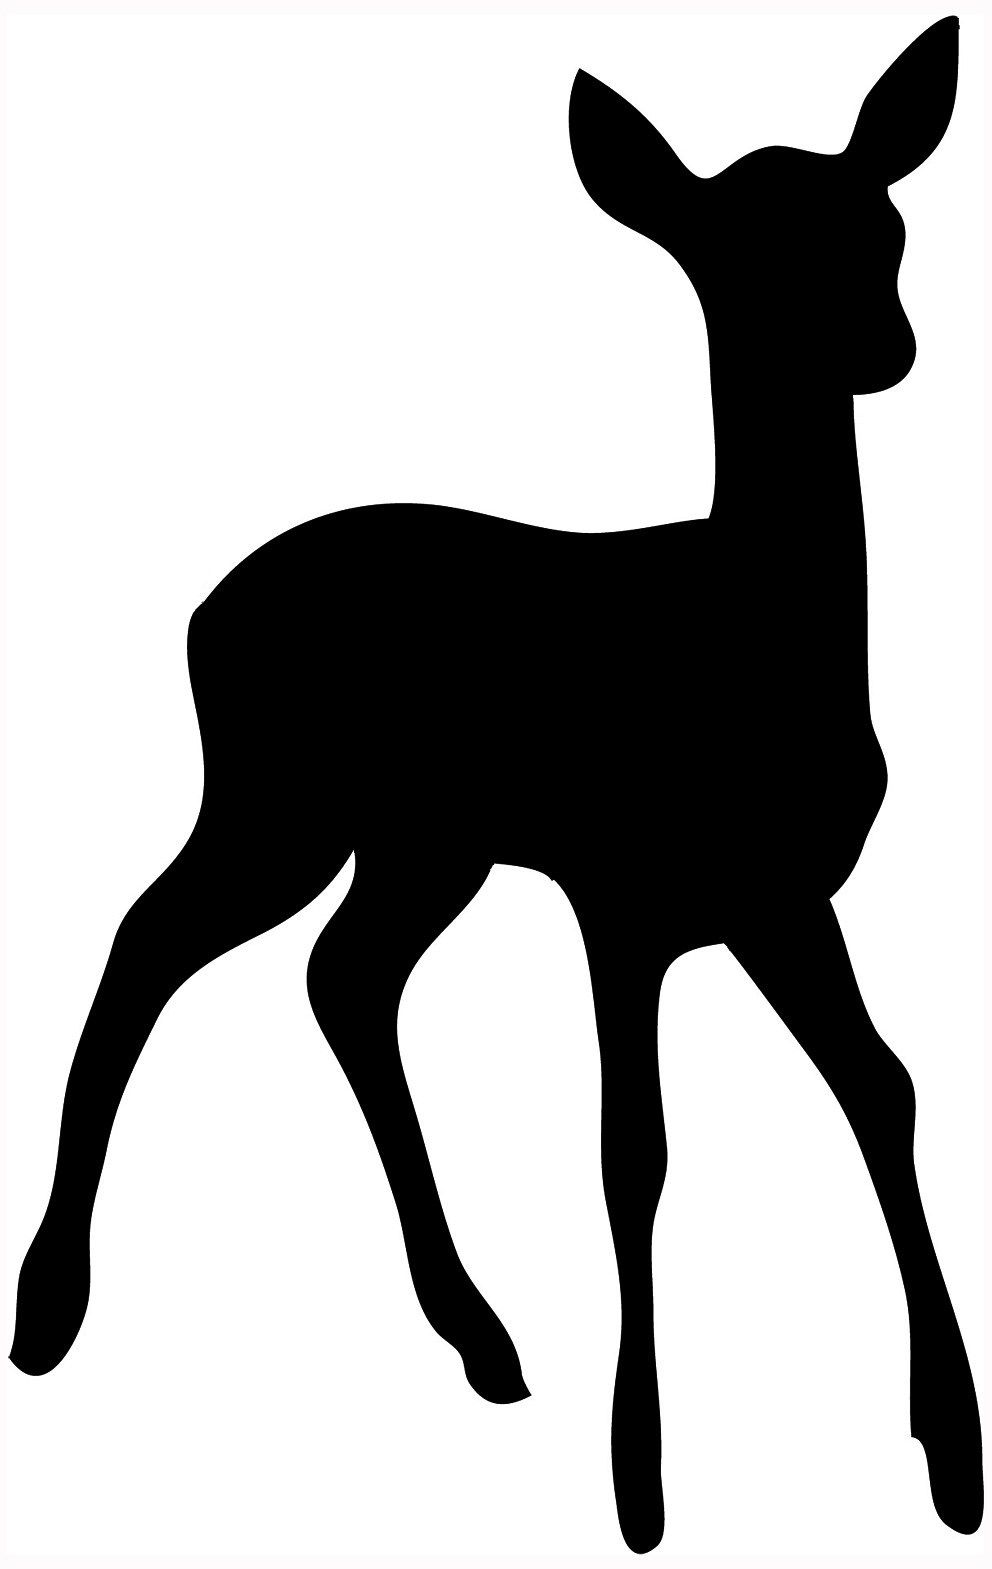 992x1569 Whitetail Deer Silhouette Clip Art